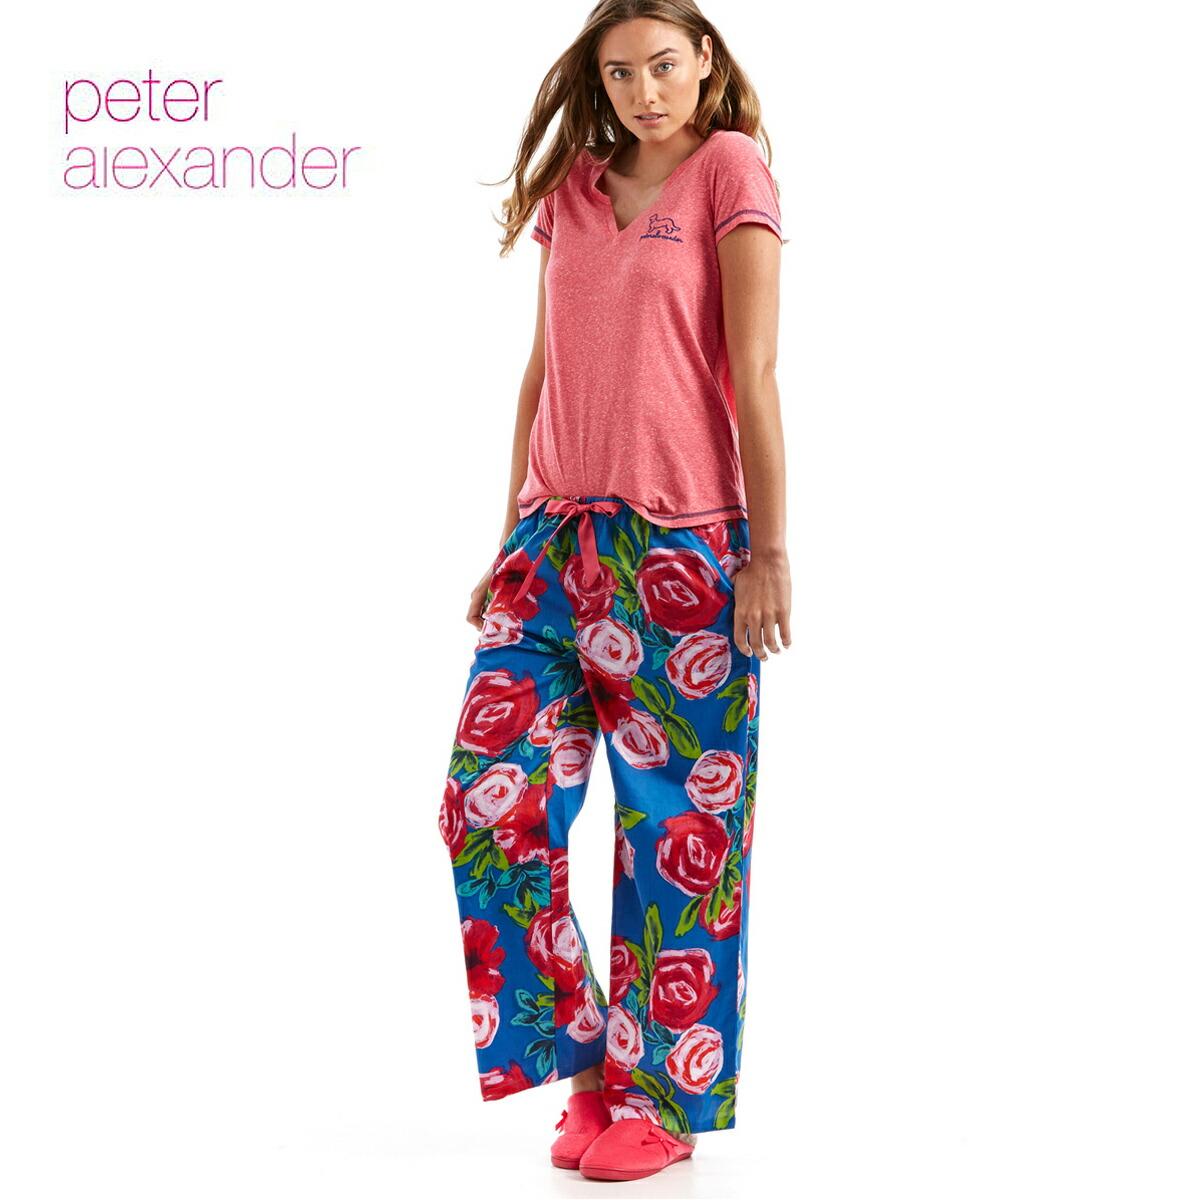 peter alexander ピーターアレキサンダー プリンテッドローズワイドレッグ パジャマパンツ